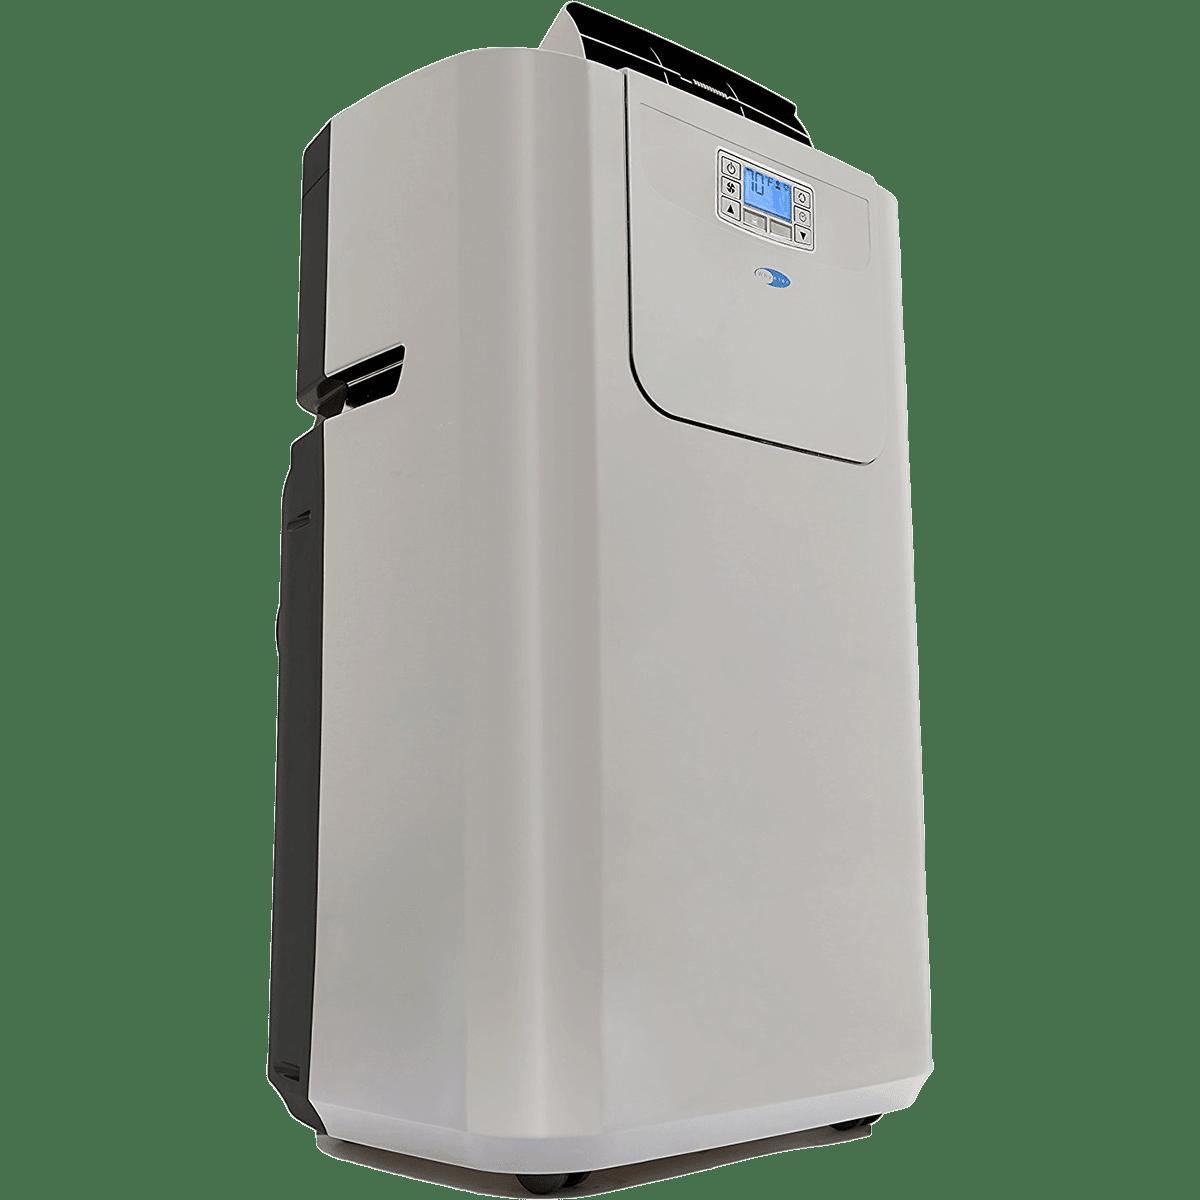 Whynter Elite 12,000 BTU Digital Dual-Hose Portable Air Conditioners wh5119